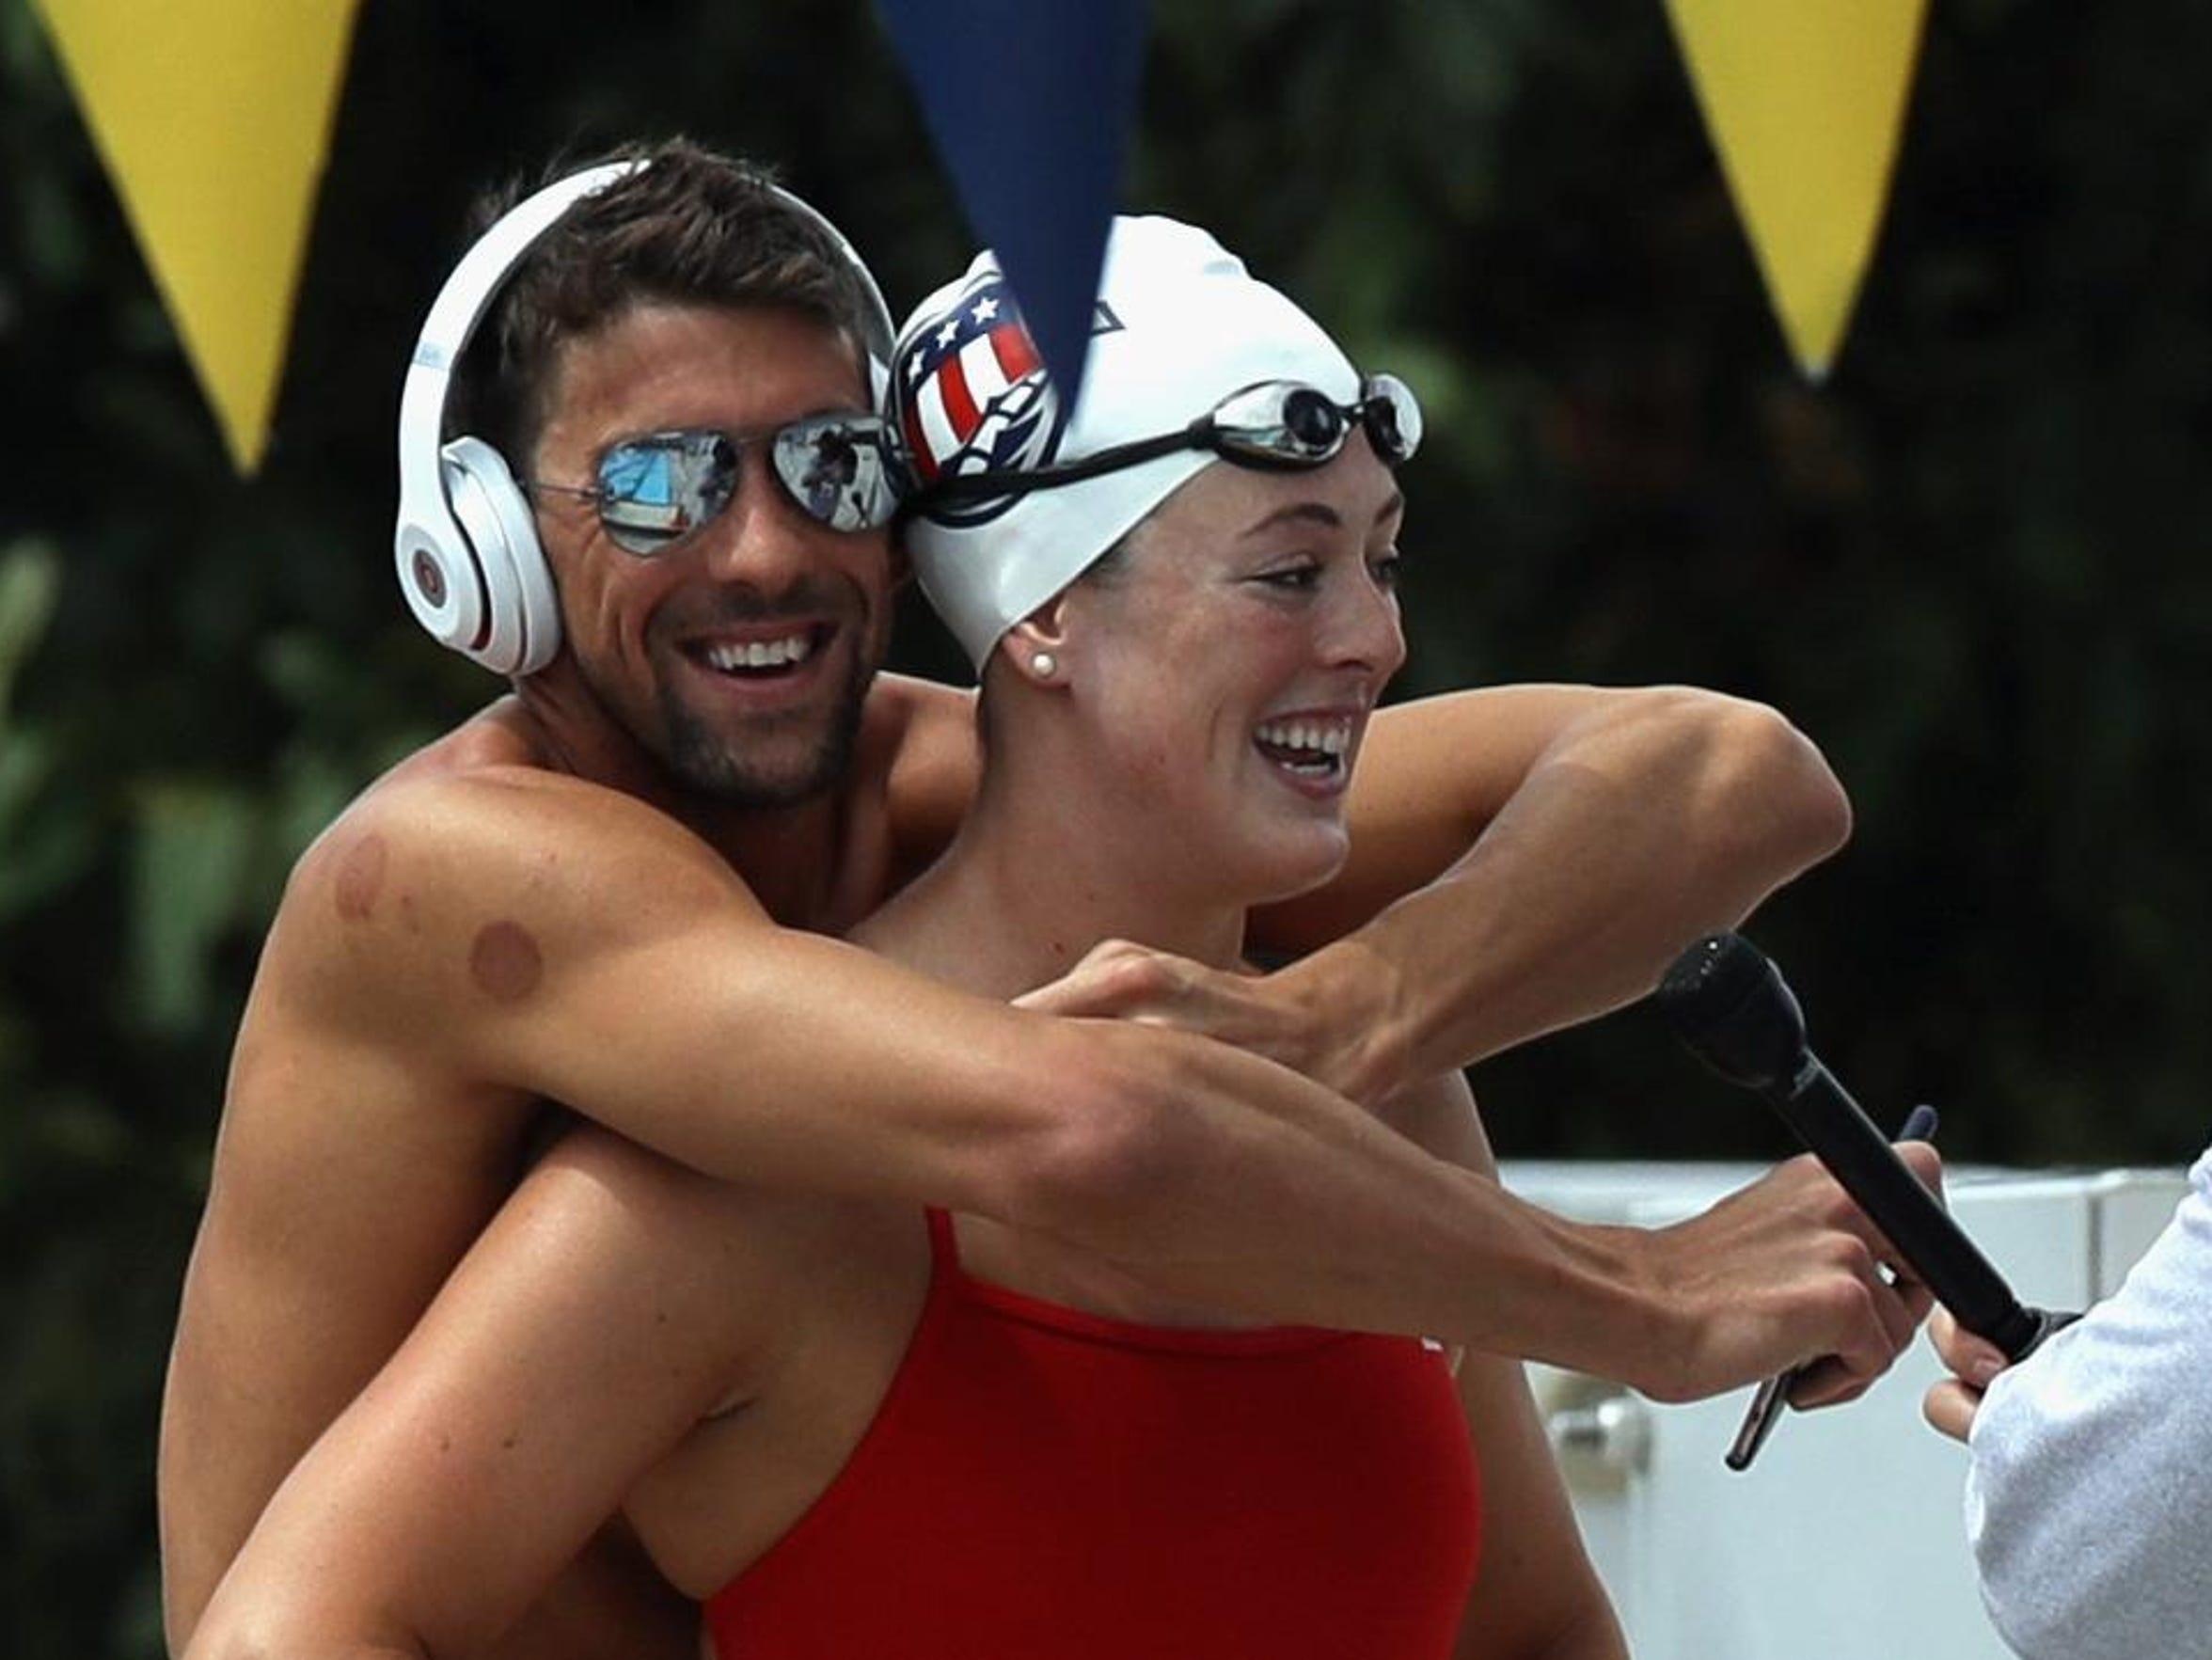 2016 U.S. Olympic Swimming Team Training Camp Media Day